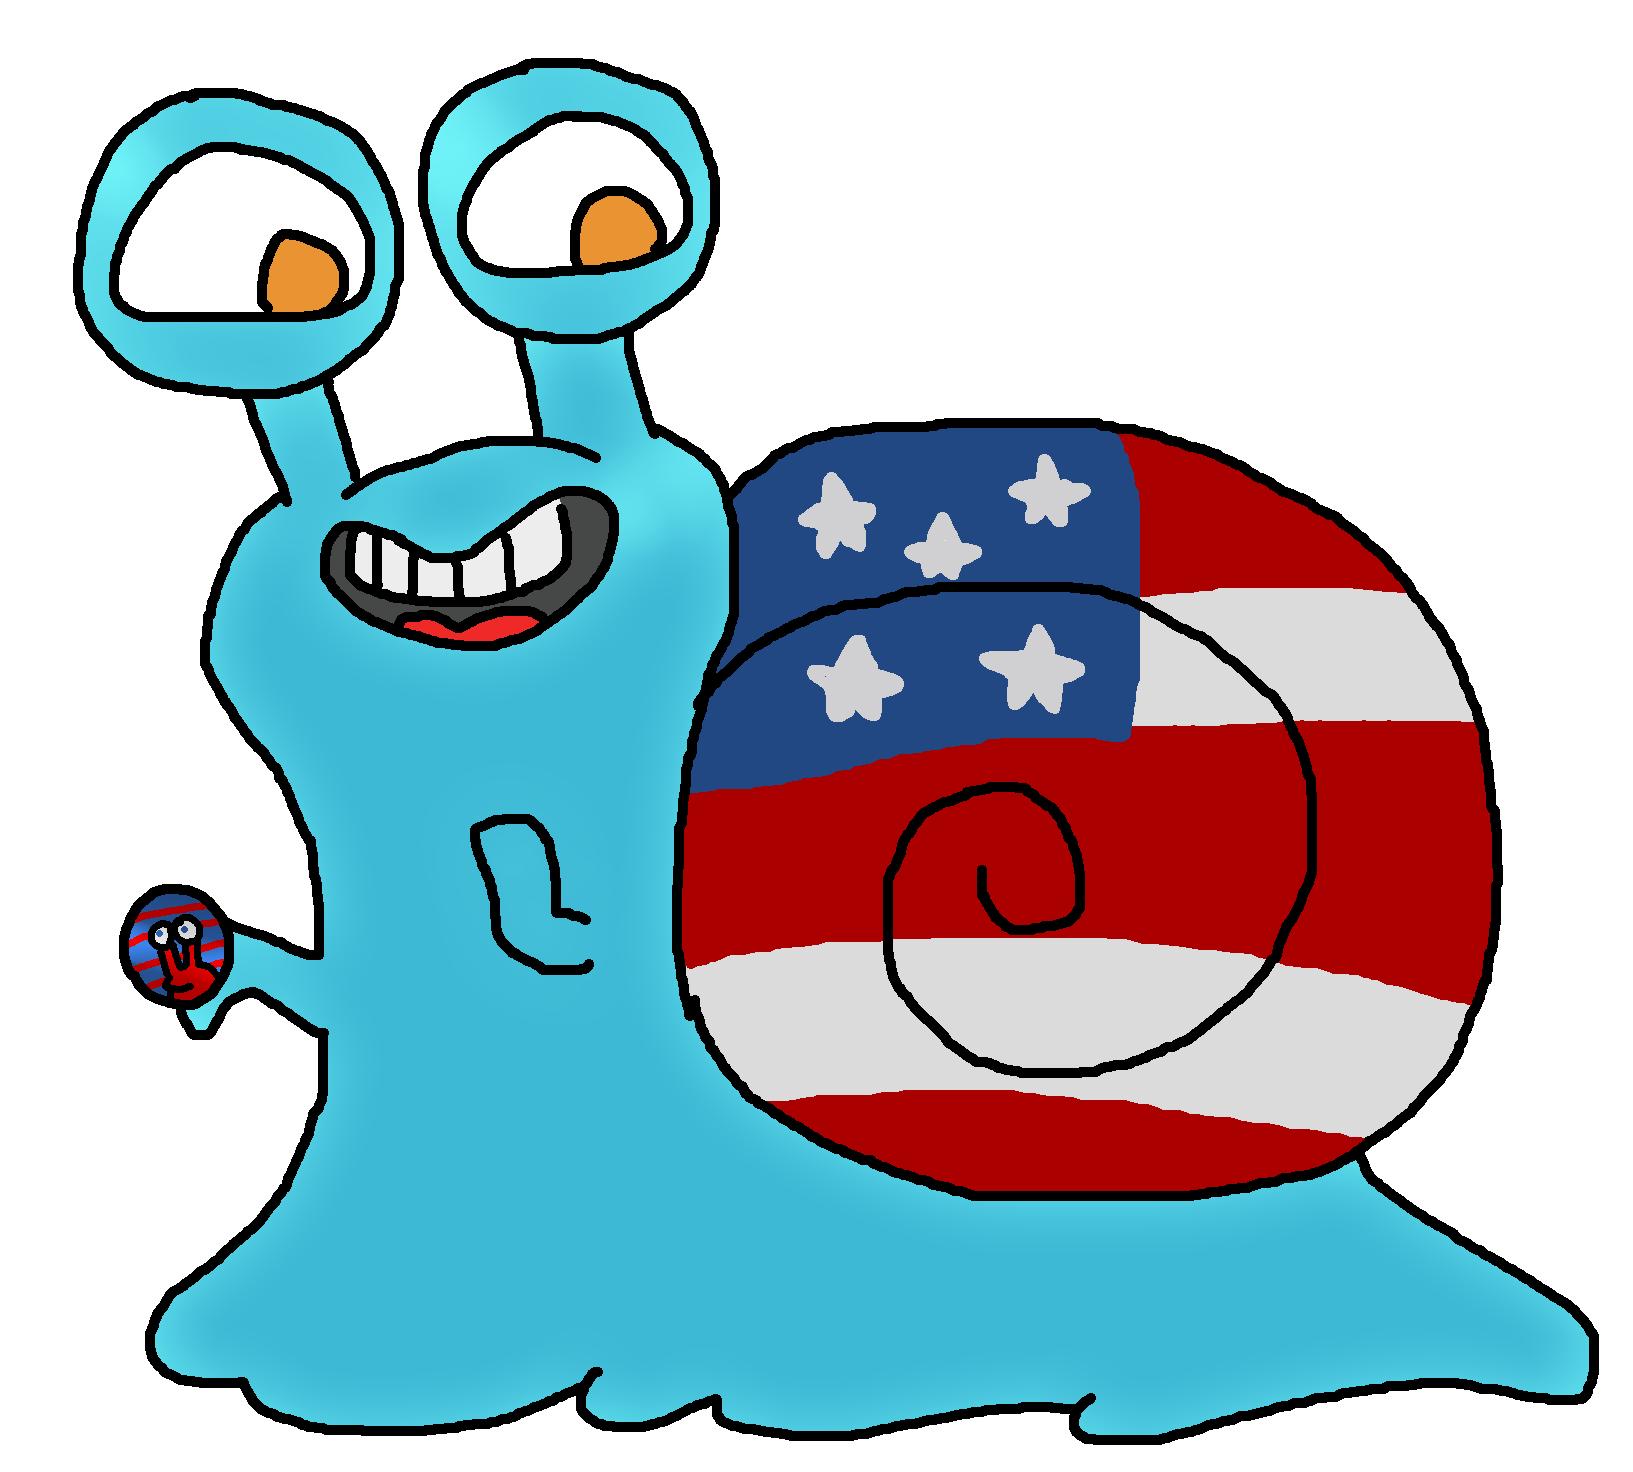 clip art royalty free download Snaily Joe